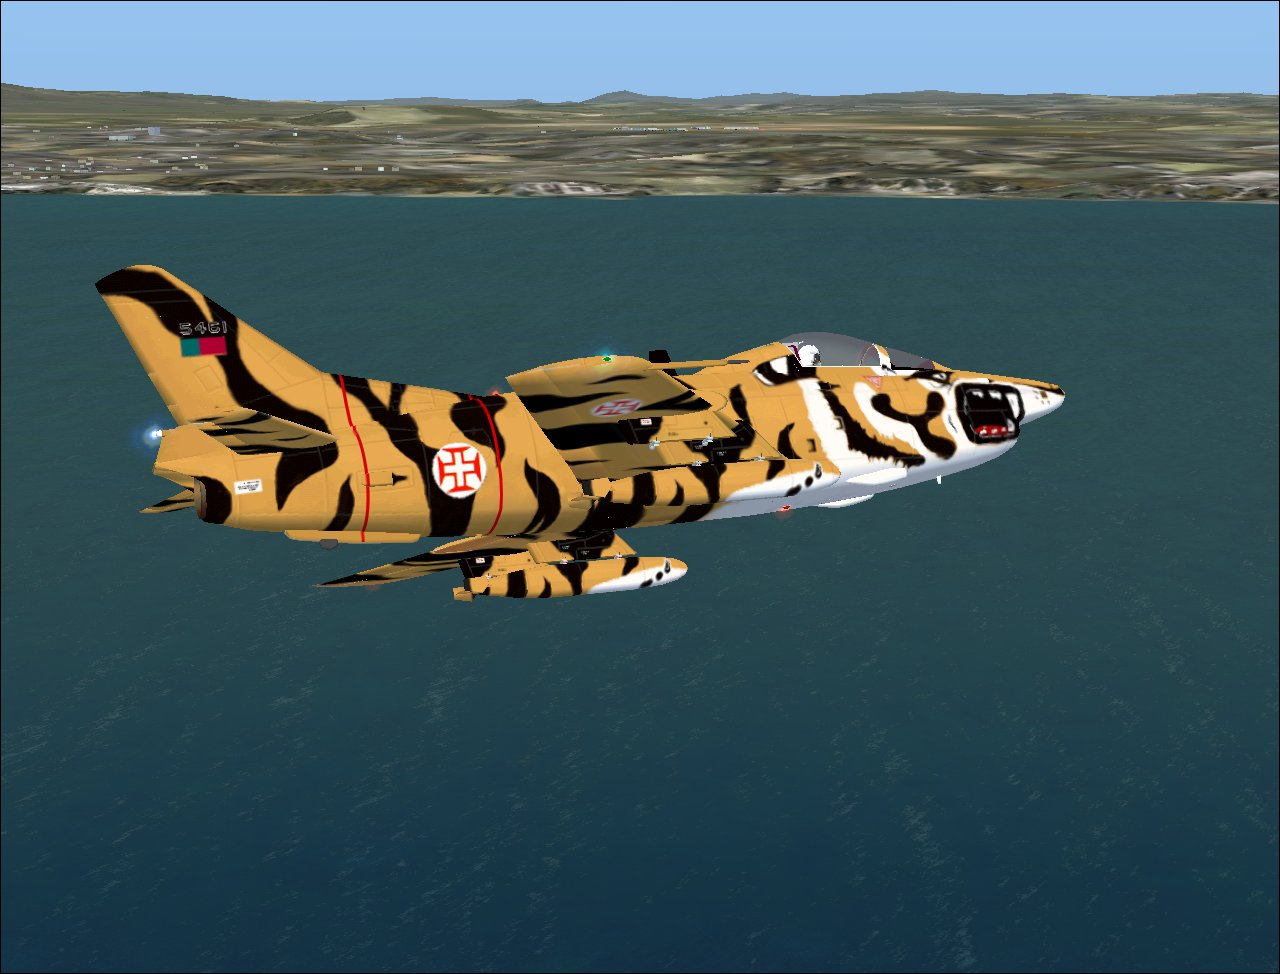 AirJorge Fotos: Flight Simulation - Fiat G-91